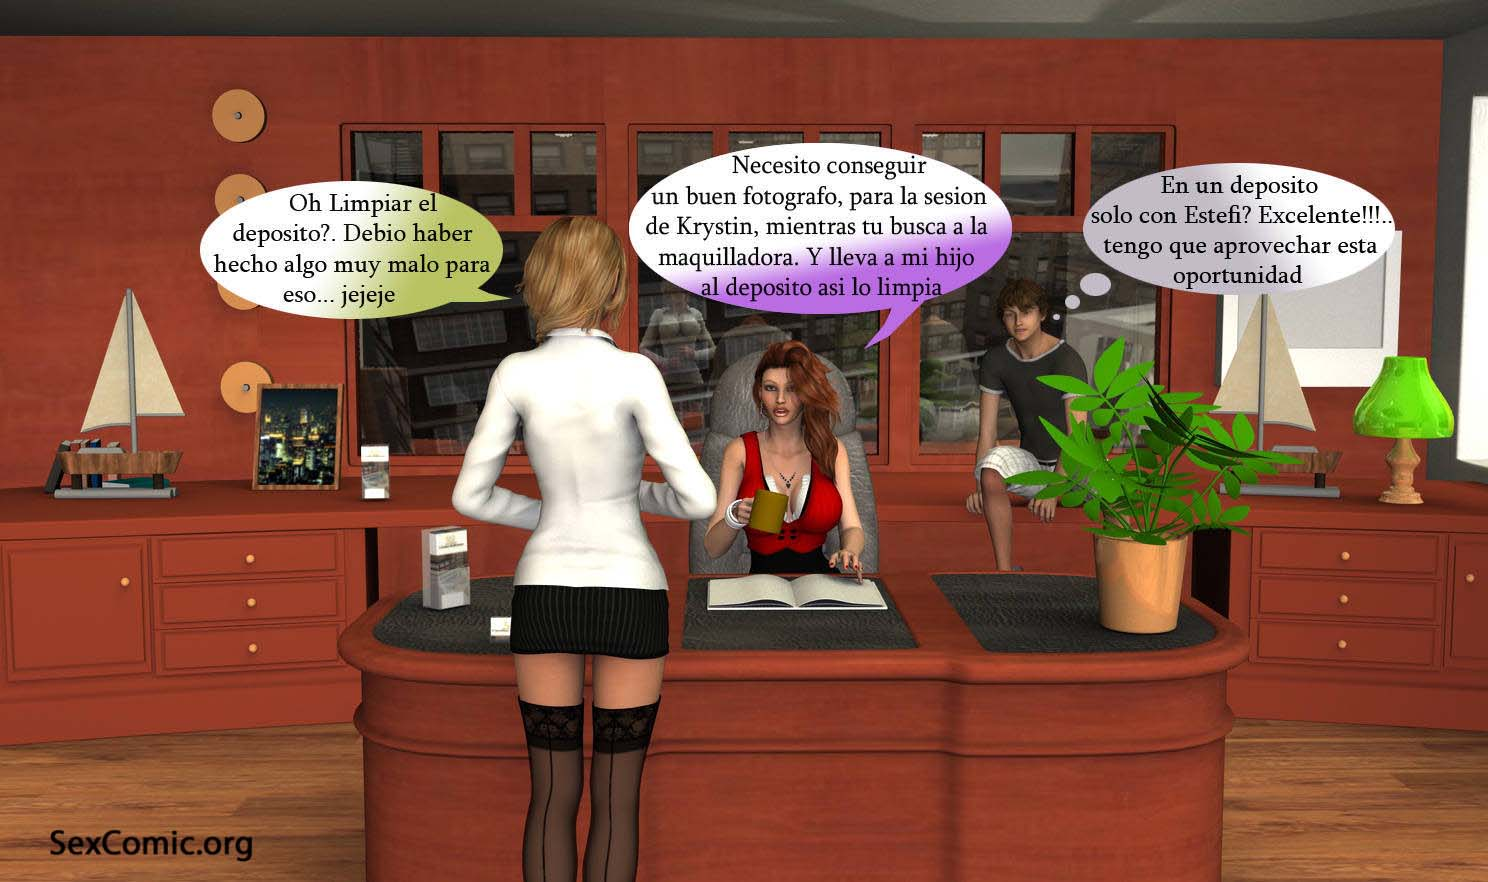 comic-xxx-3d-seduciendo-alas-empleadas-de-mama-historias-sexuales-mangas-para-adultos-videos-deincesto-comics-xxx-historias-eroticas-fantacias-sexuales-gtaris-online-24